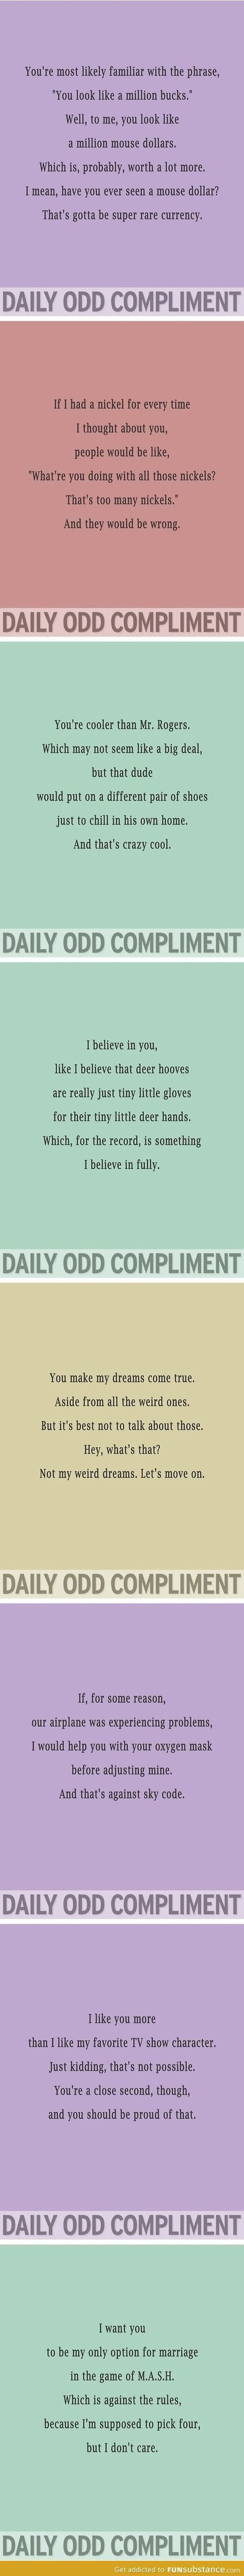 Daily odd compliment - FunSubstance.com